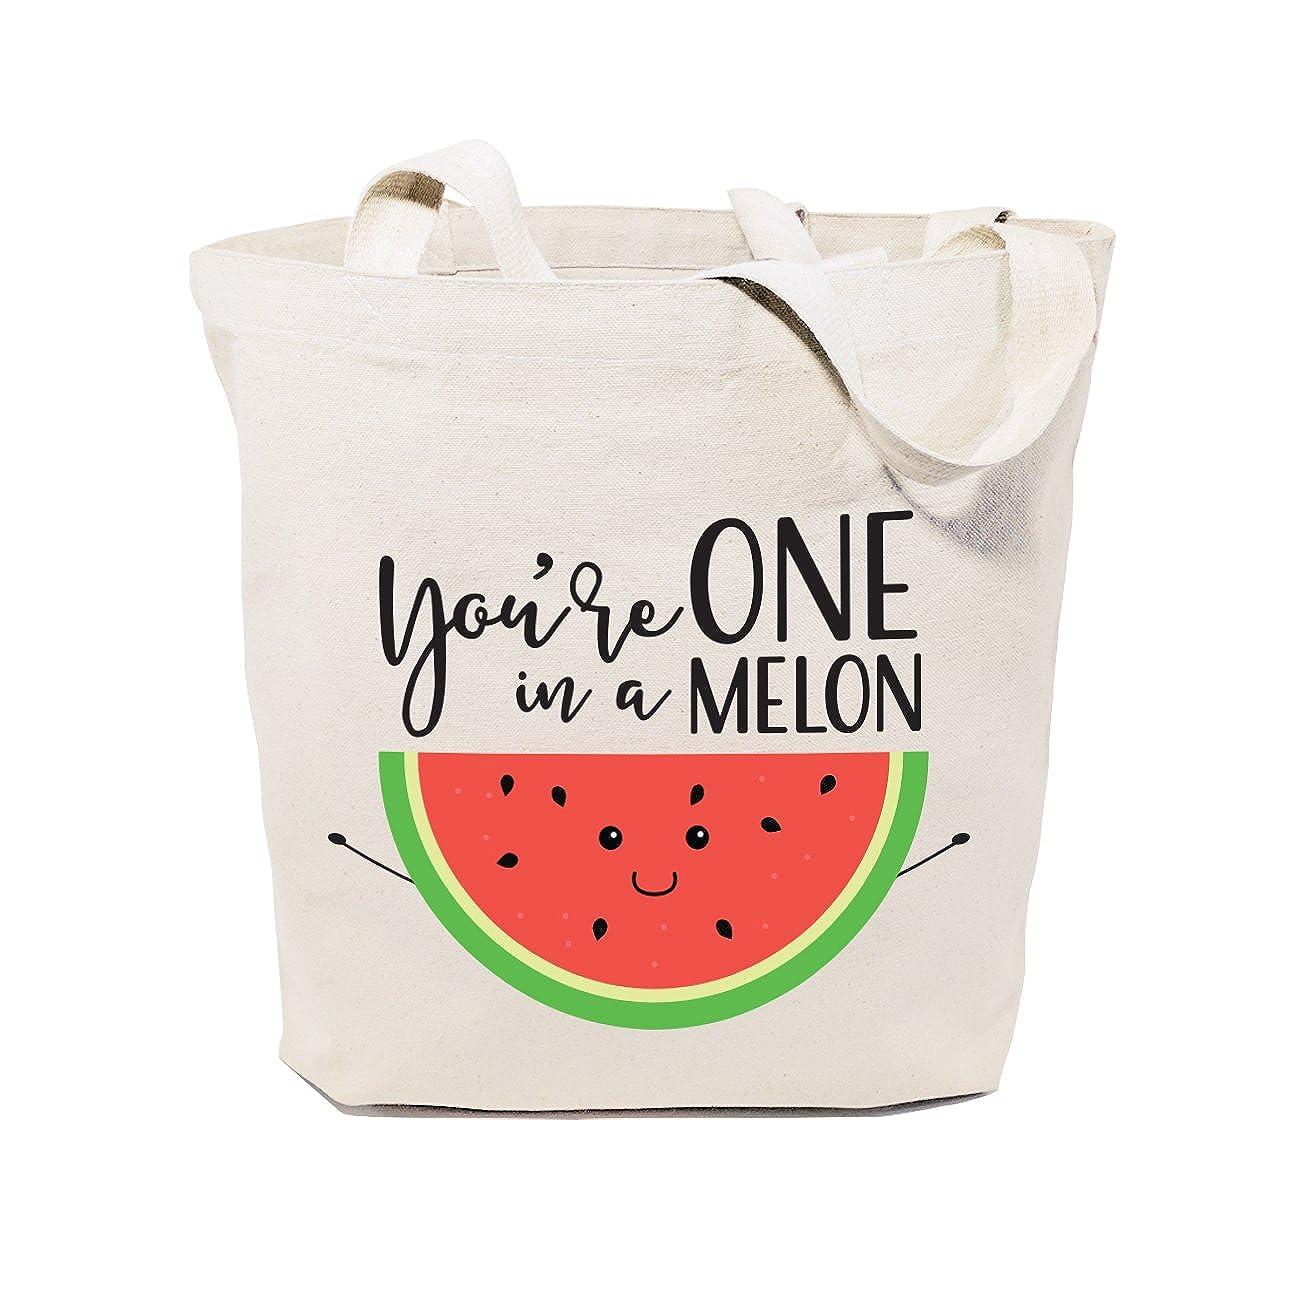 玄関先迄納品 The Cotton You're & Canvas Co. a レディース B071YP5S3T You're One Melon in a Melon You're One in a Melon, 発明屋:10553c7c --- 4x4.lt